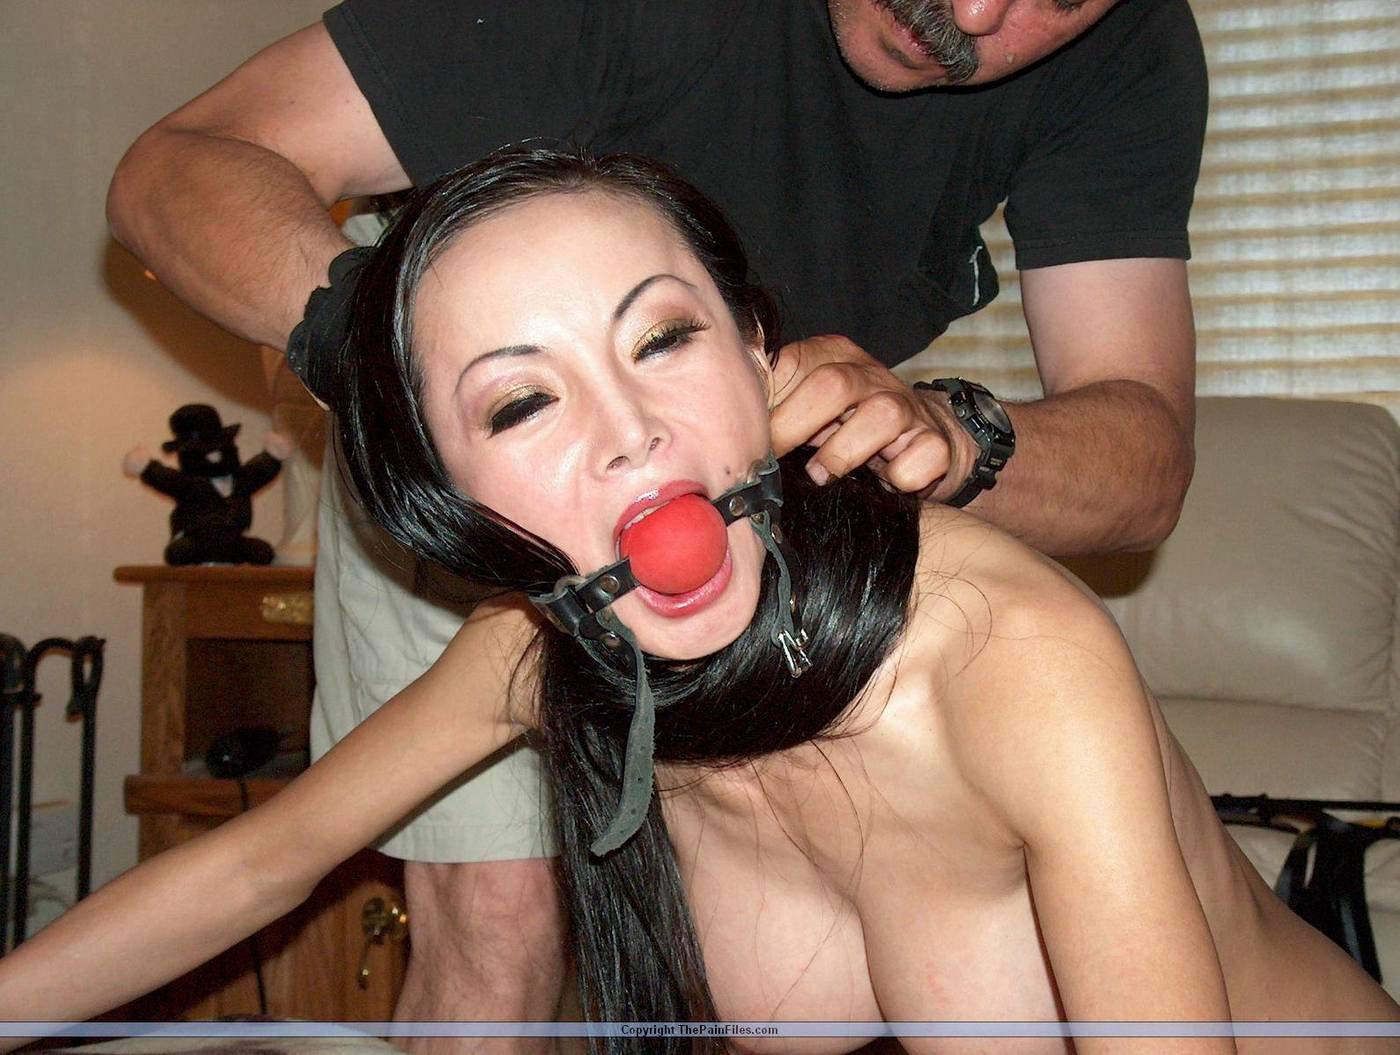 spanking erotik venus 2000 melkmaschine